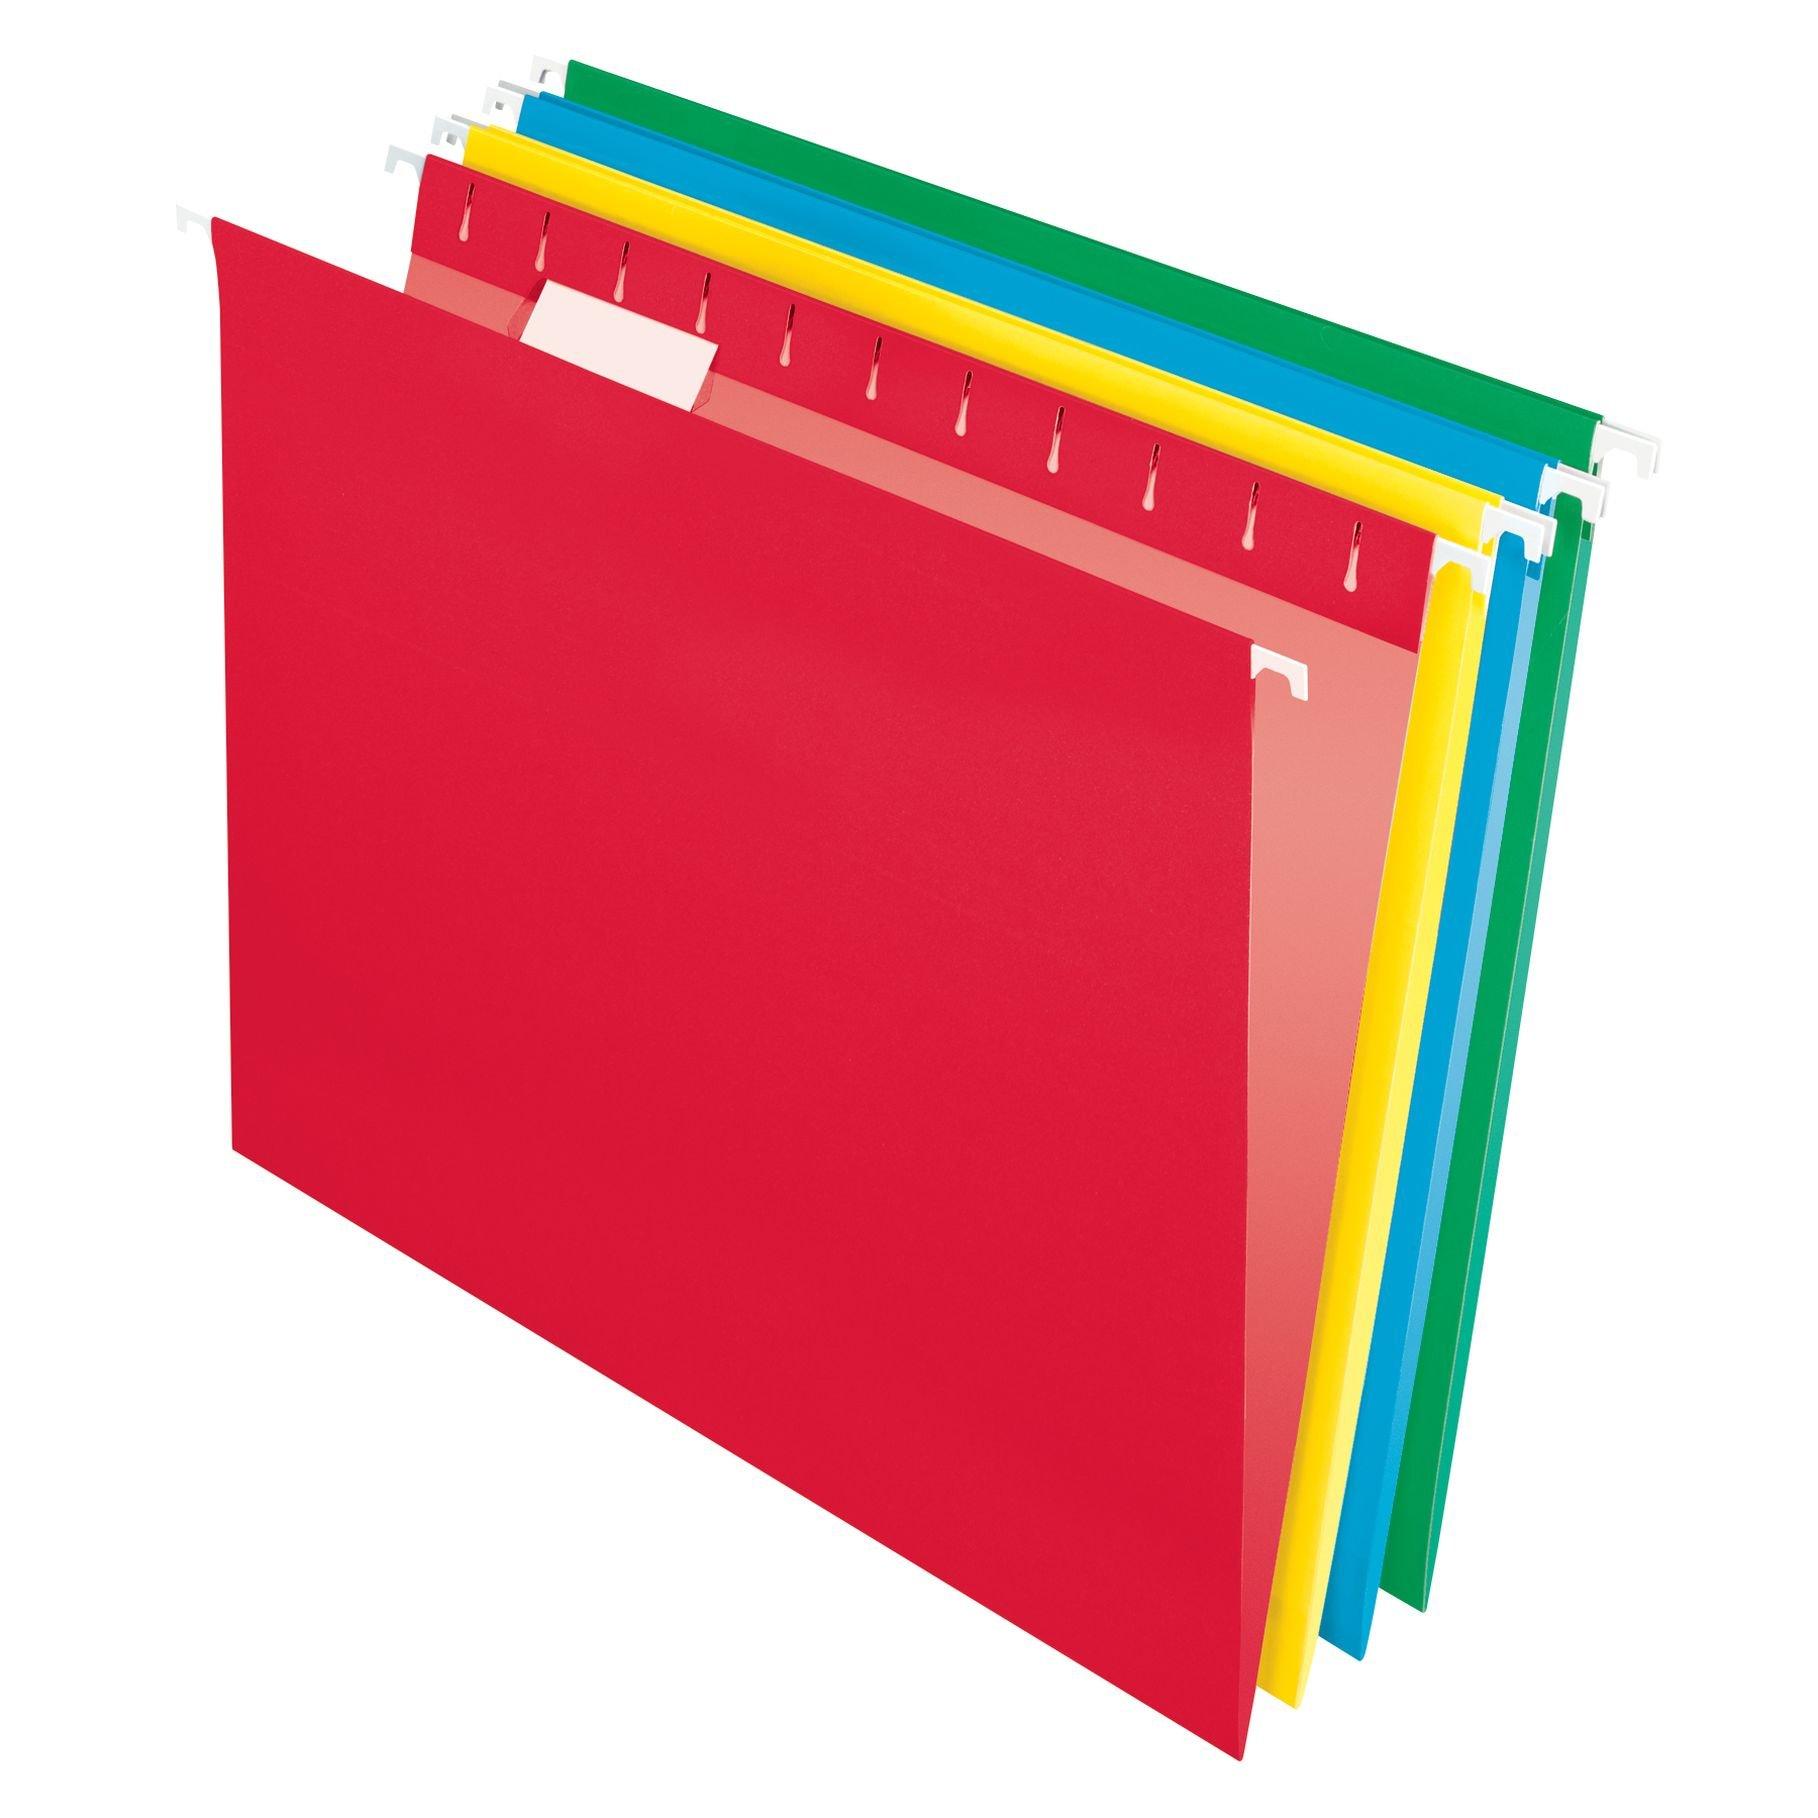 Pendaflex Essentials Hanging Folders, Letter Size, Assorted Colors, 25 per Box (75708) by Pendaflex